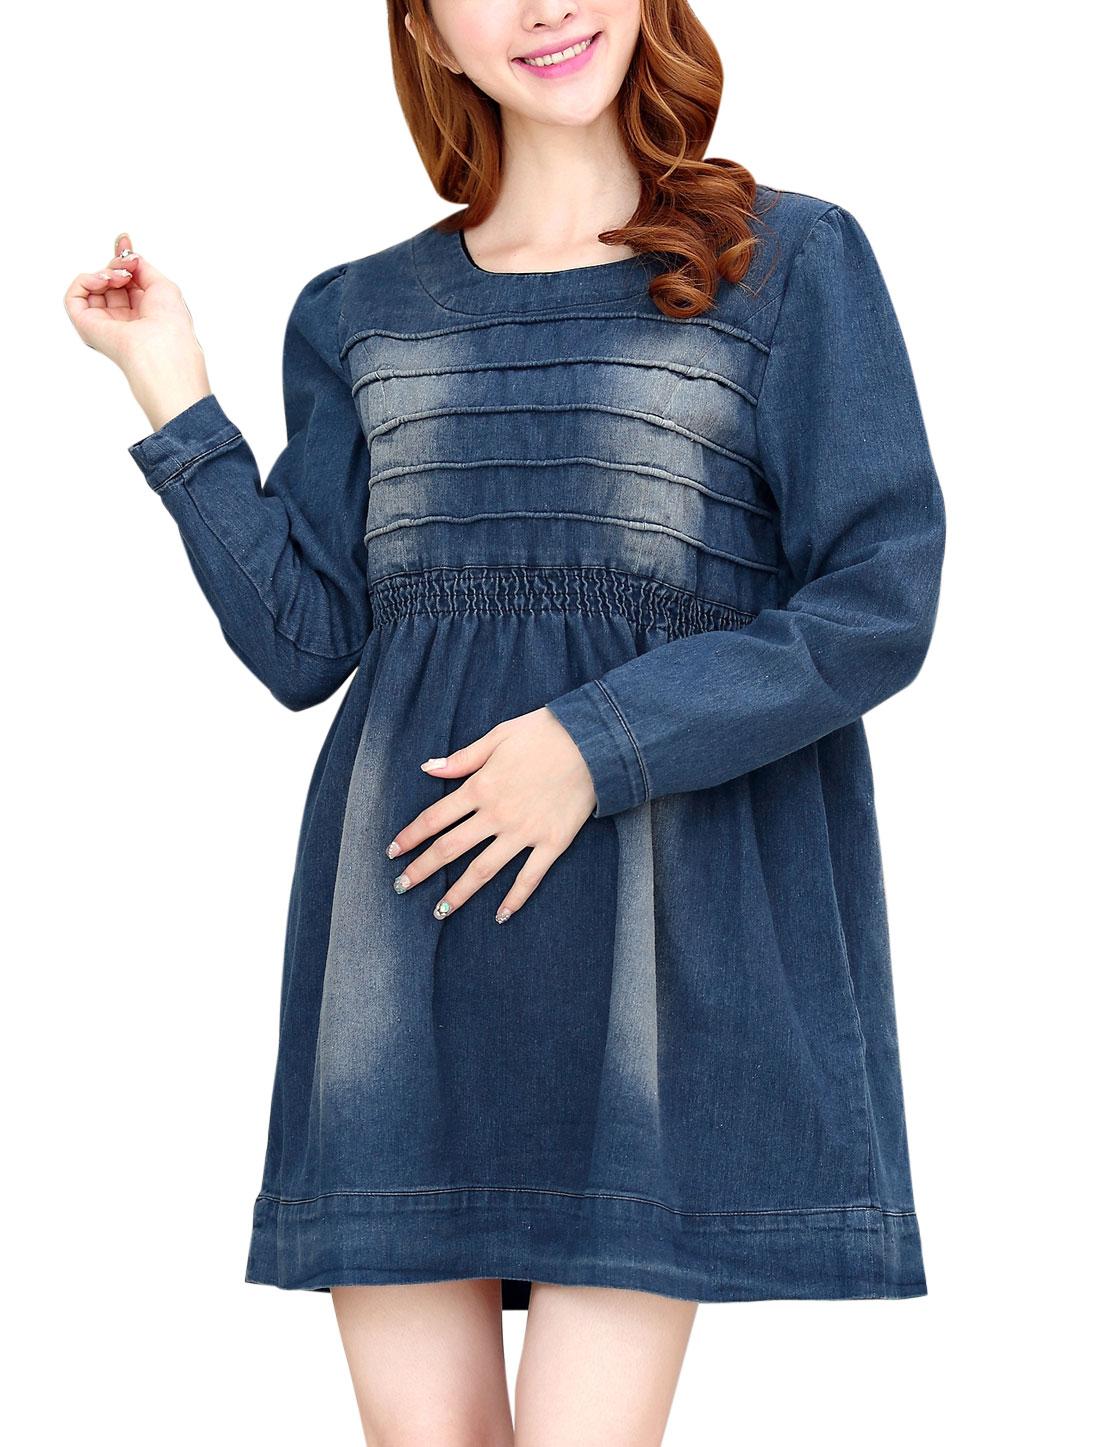 Maternity Round Neck Elastic Waist Stitched Design Denim Dress Blue S